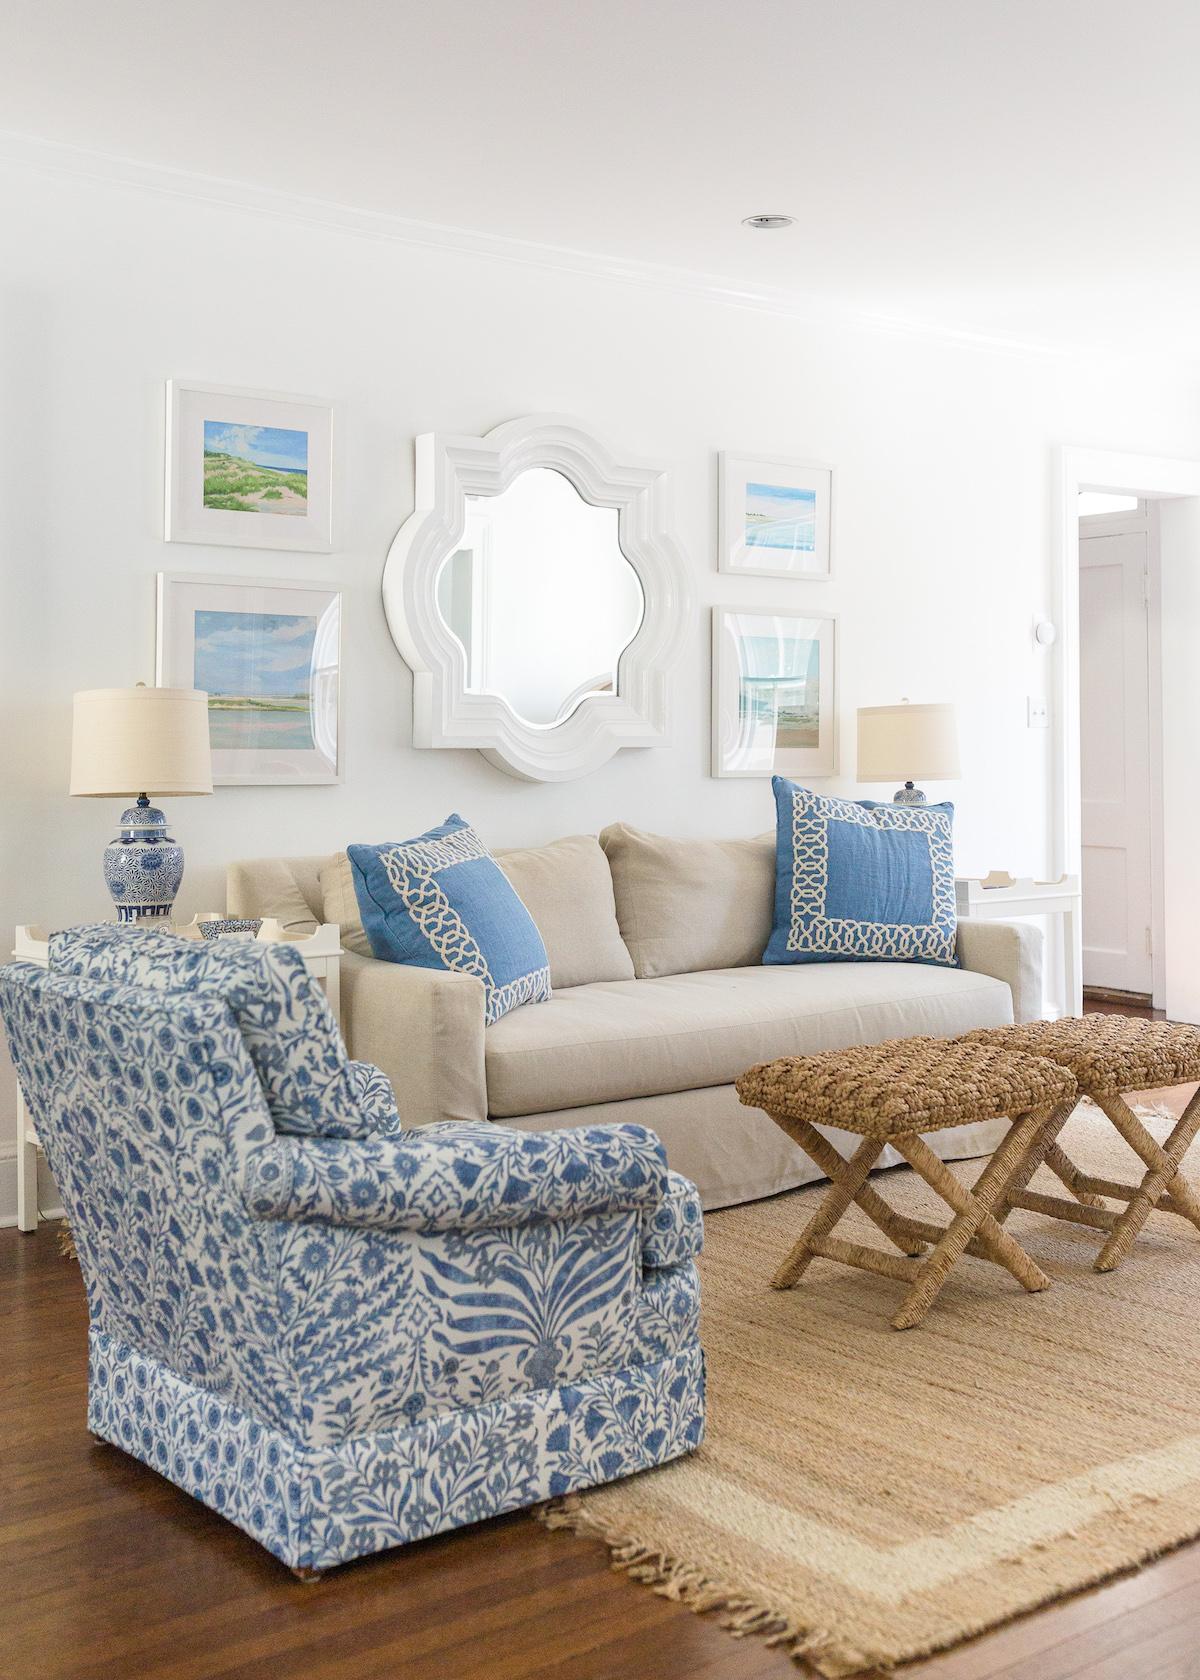 design darling living room quatrefoil mirror lee jofa sameera chairs